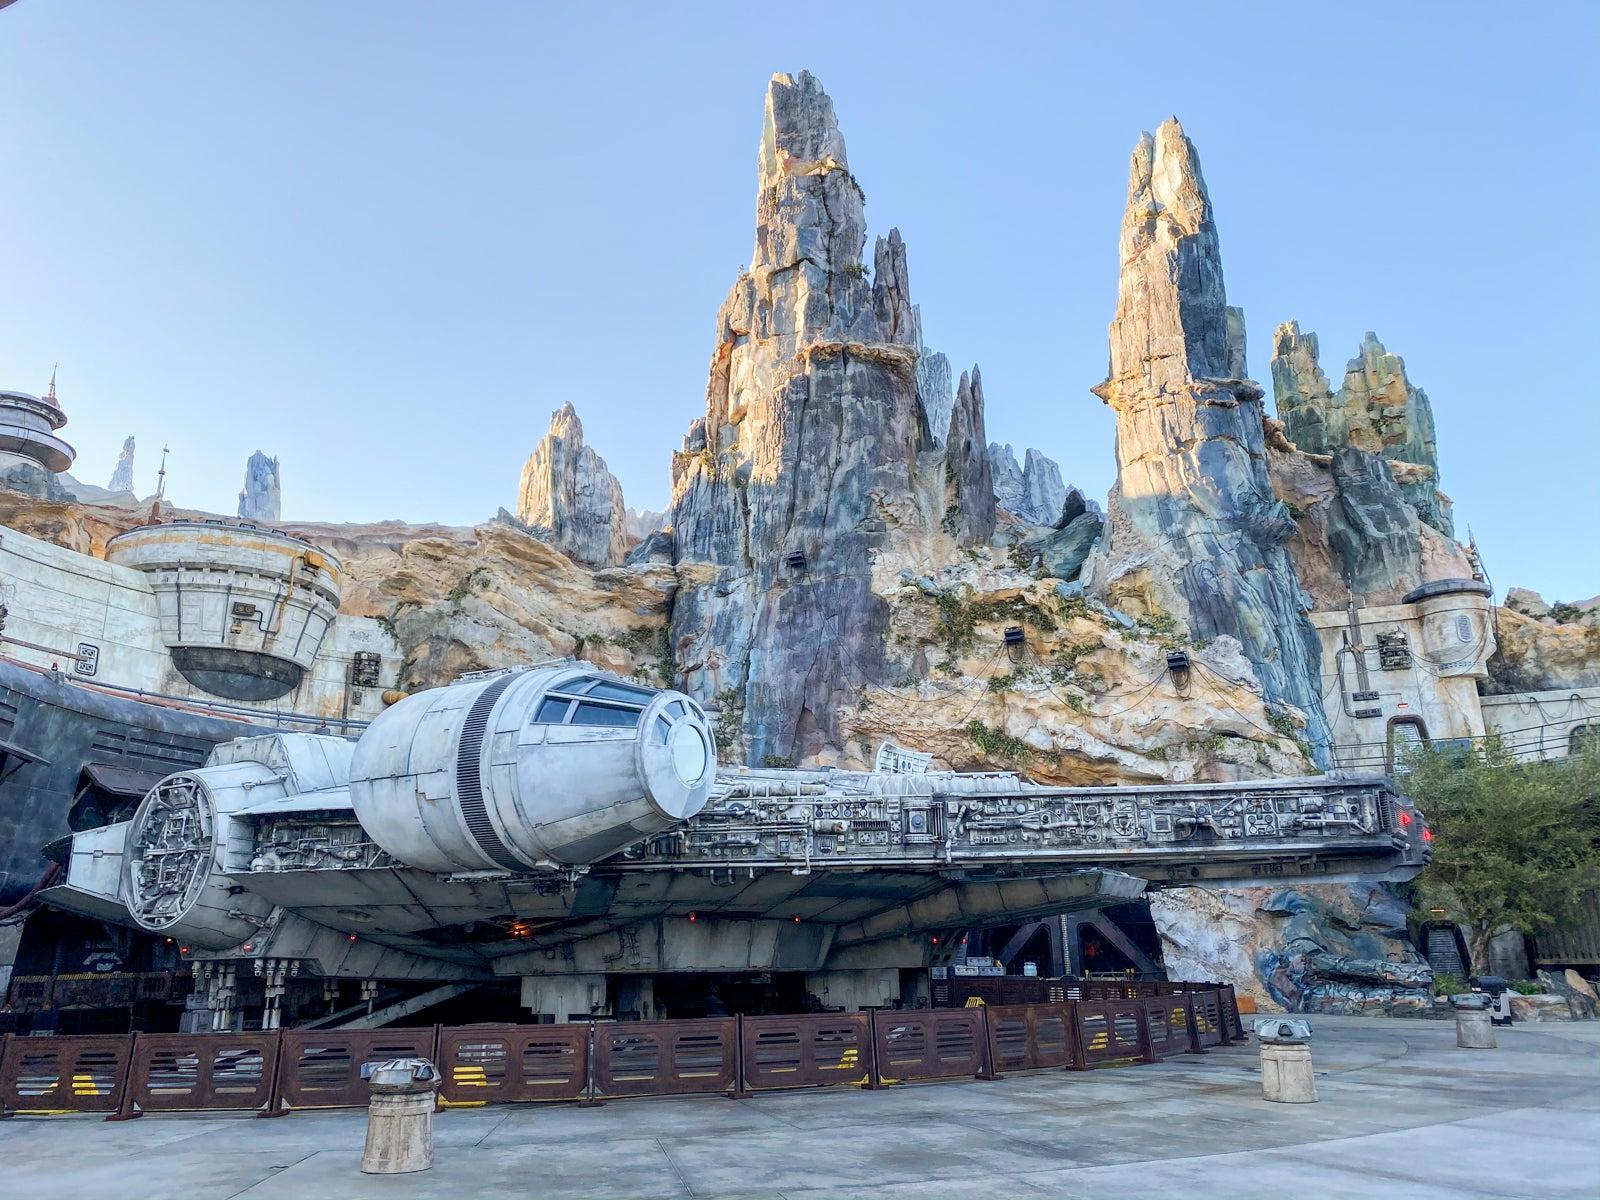 Guide to visiting Star Wars: Galaxy's Edge at Disney World